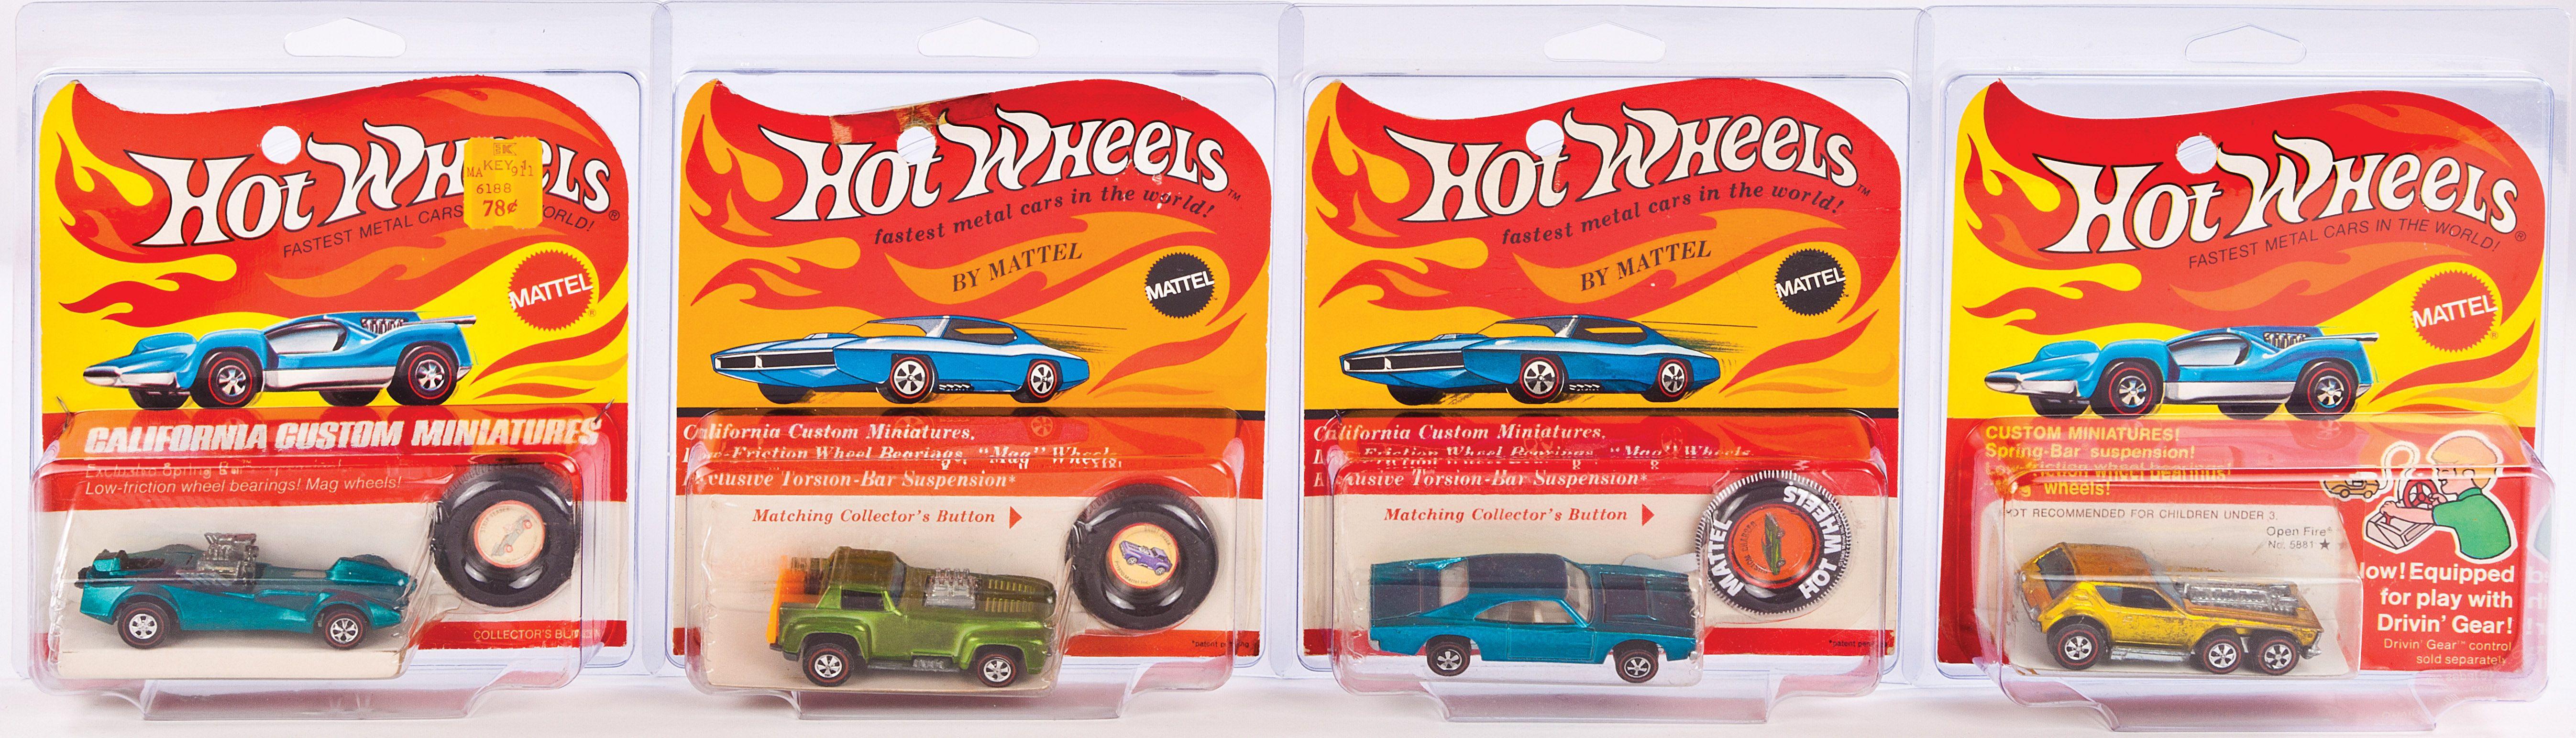 Old German Made Hot Wheels Cars